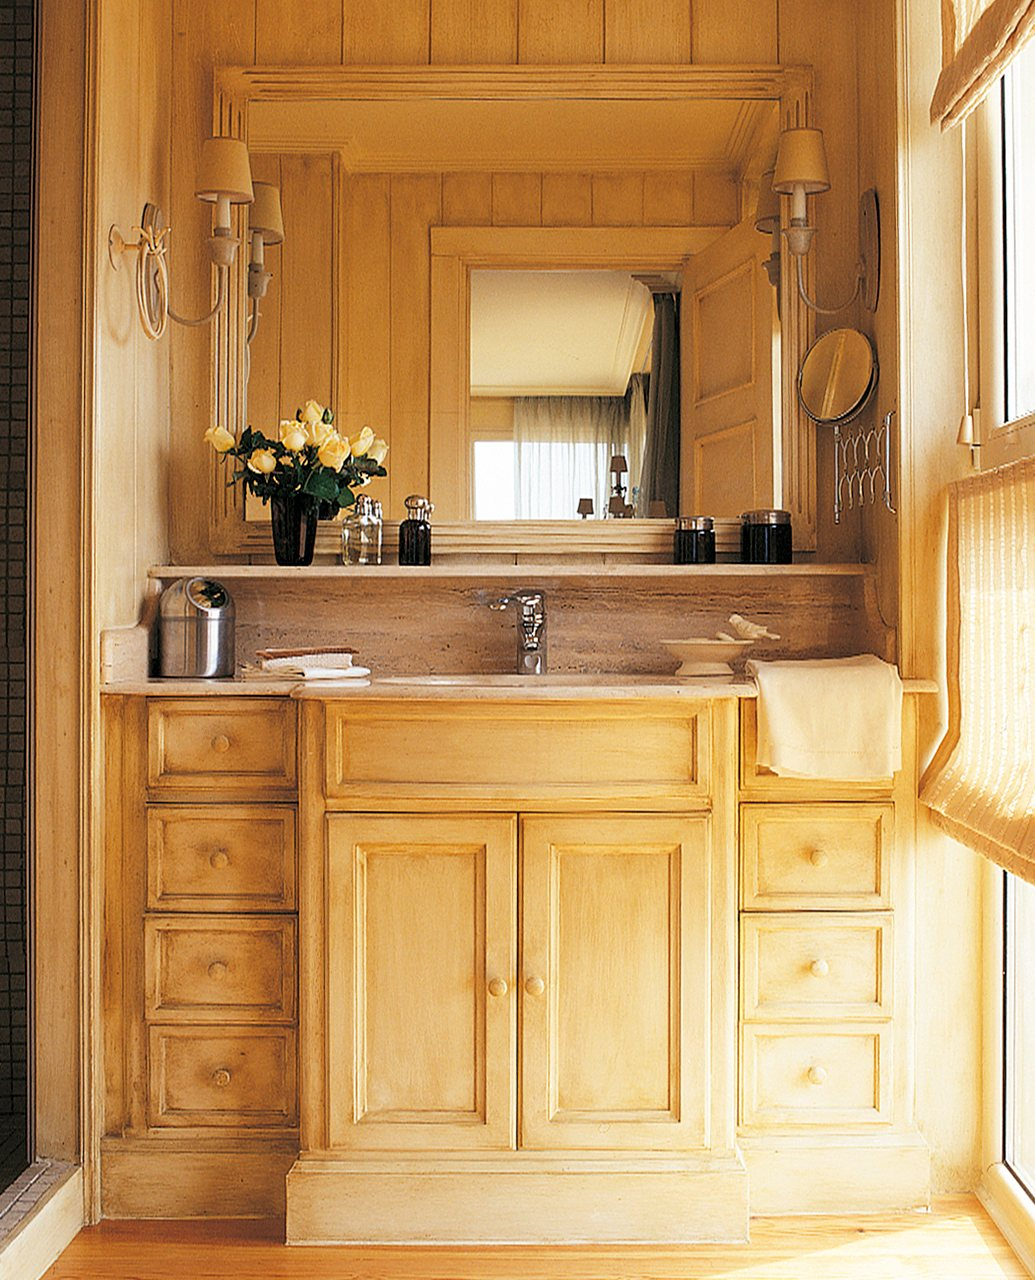 Dormitorios perfectos ideas para inspirarte for Revestimiento de madera para banos